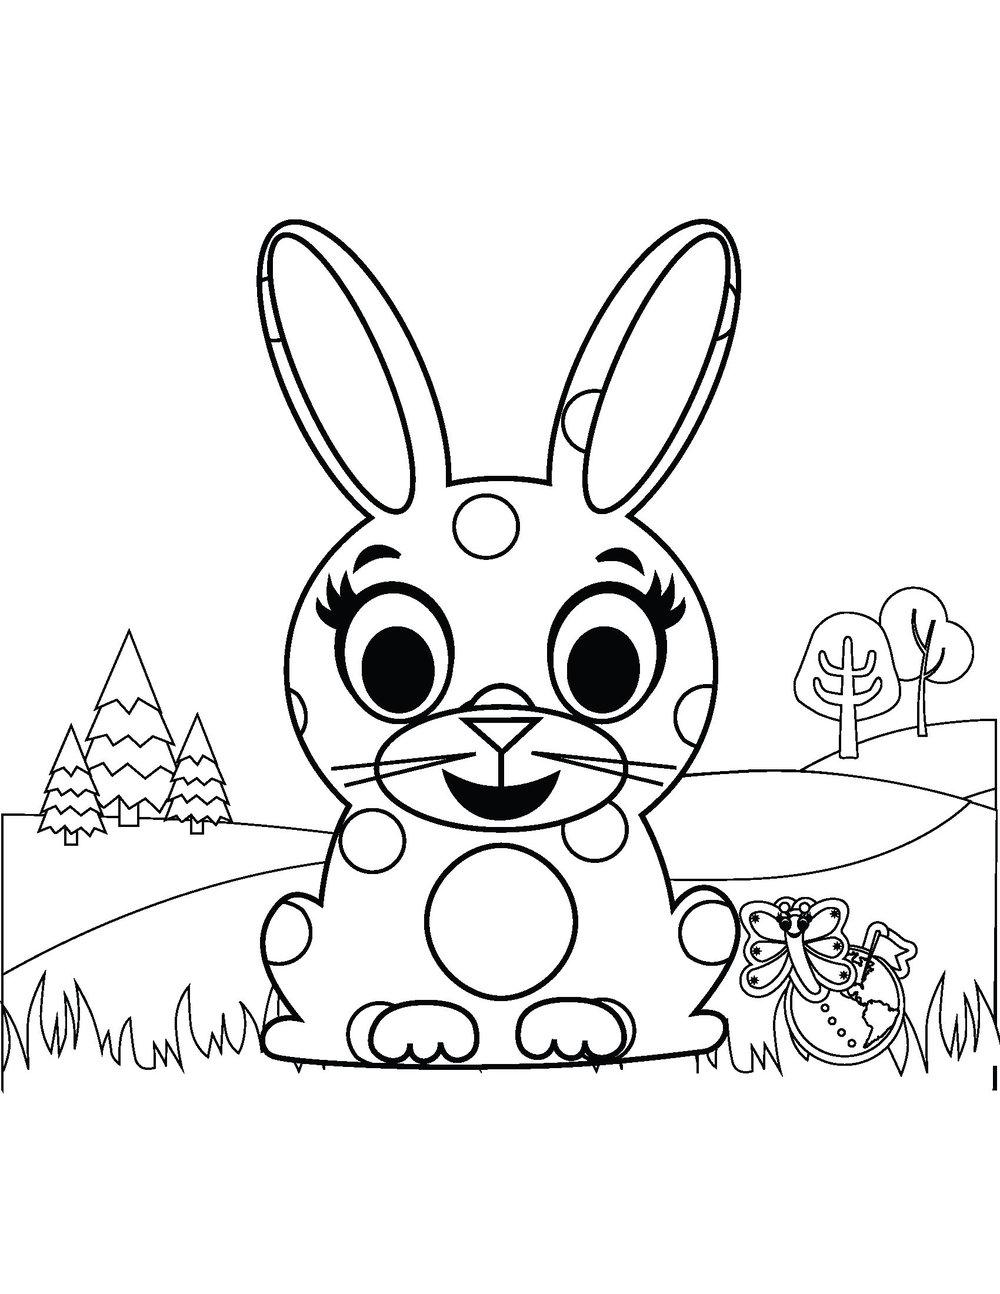 Penelope the Rare Bunny